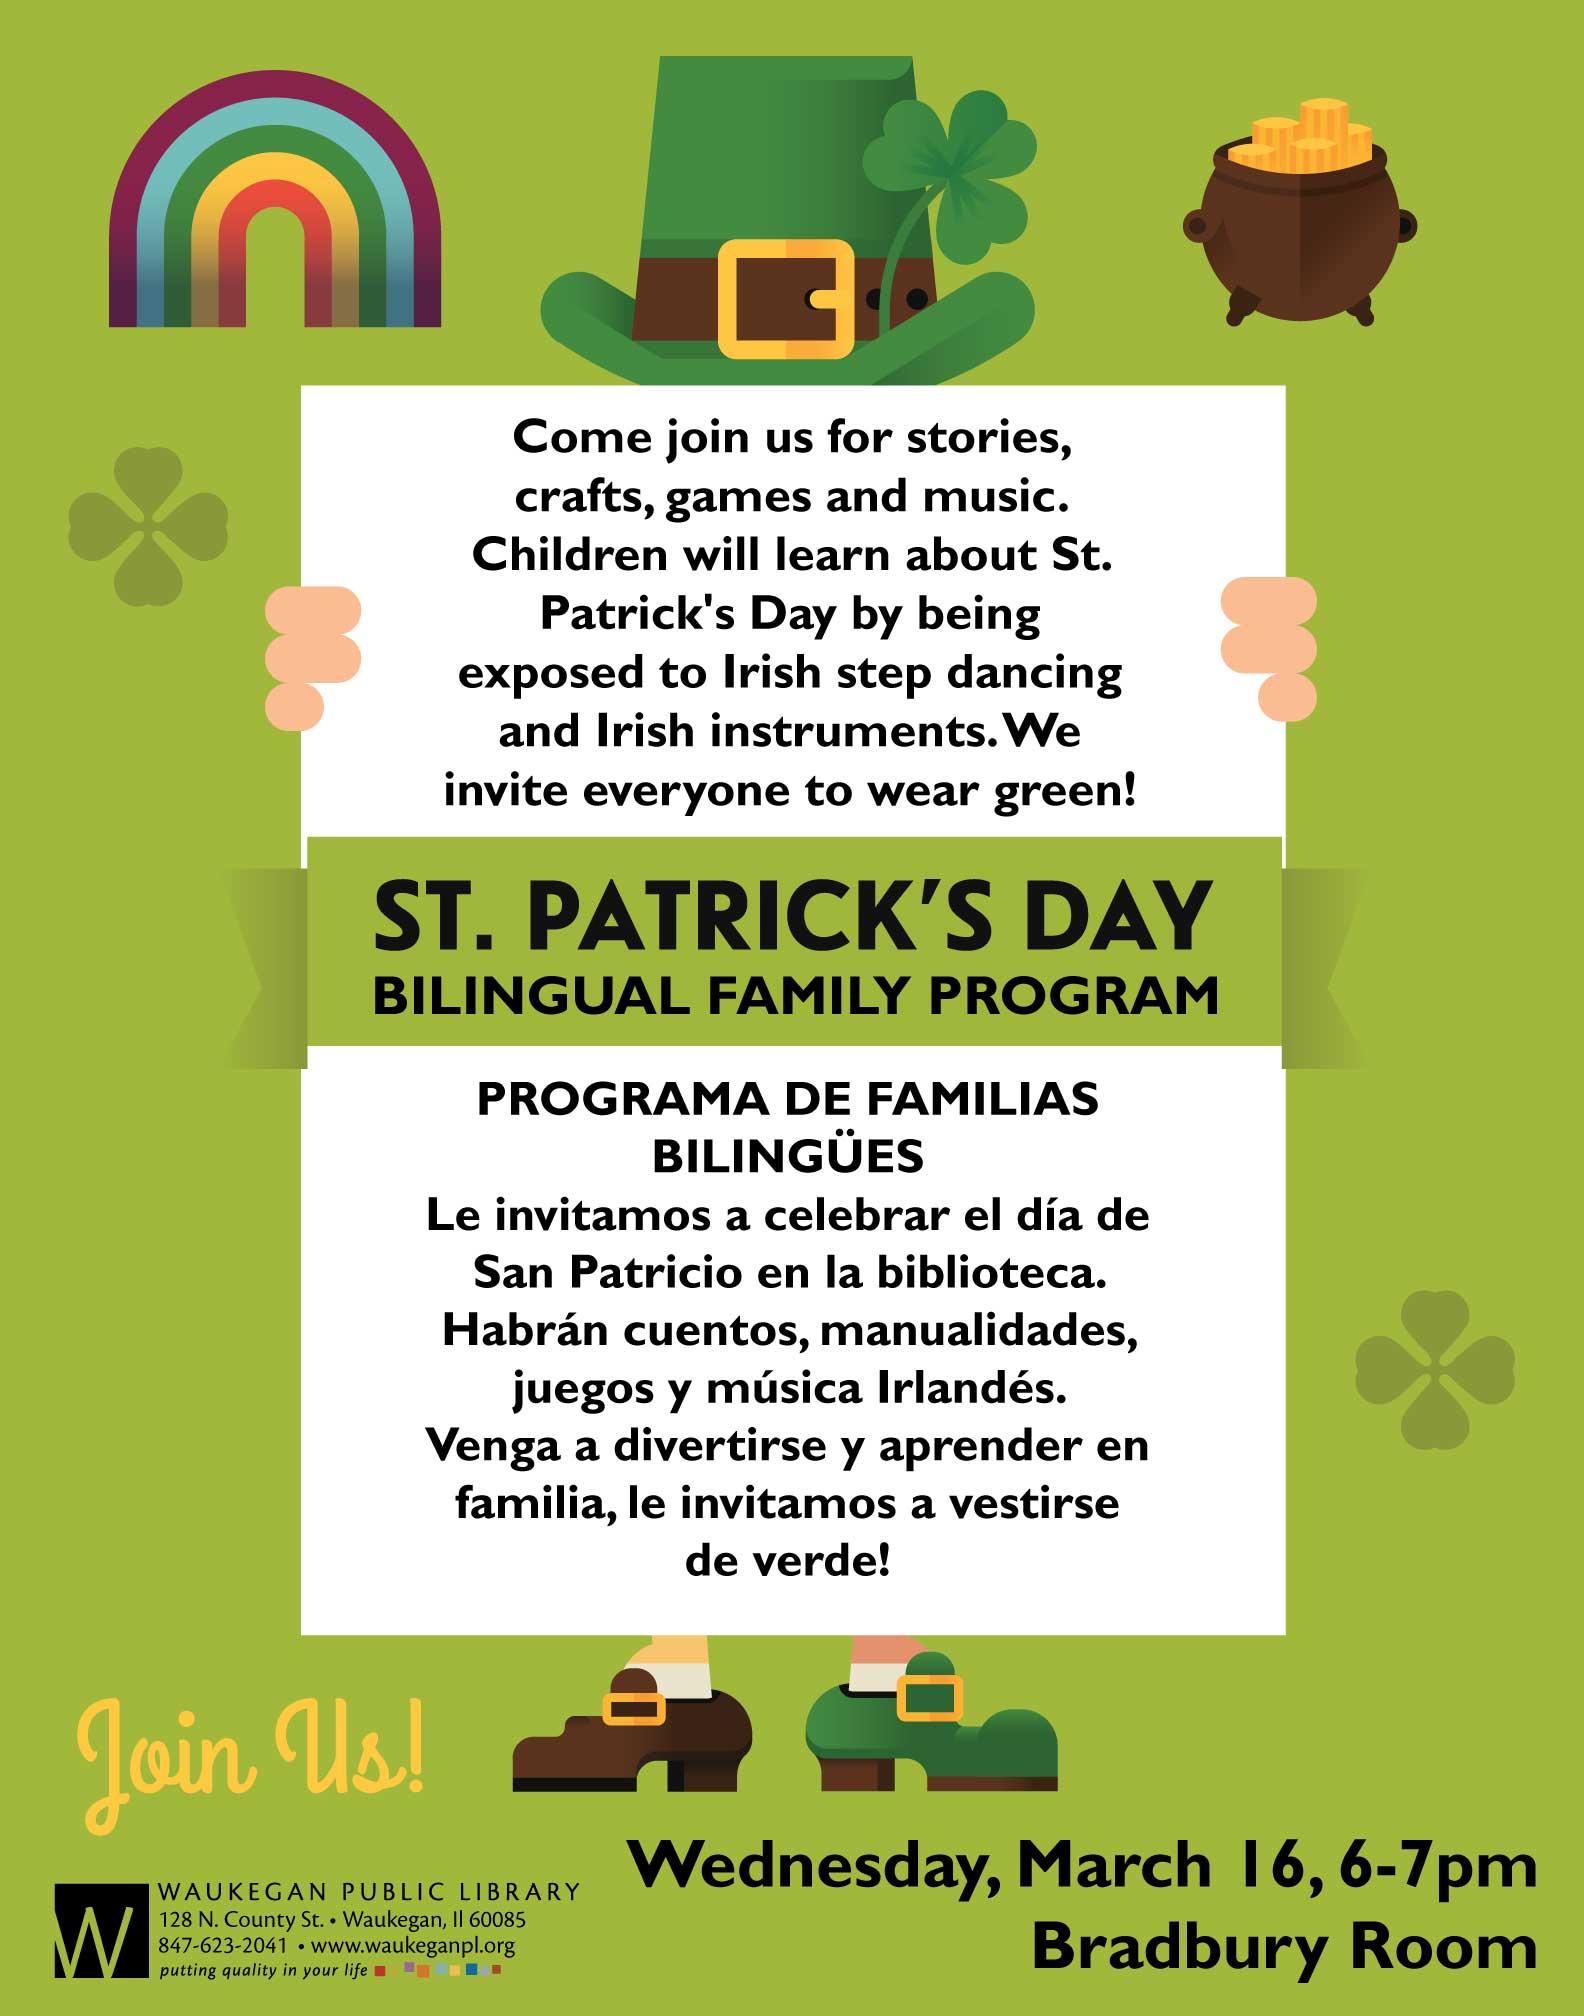 St.-Patrick's-Day-22-x-28-Bilingual-Program